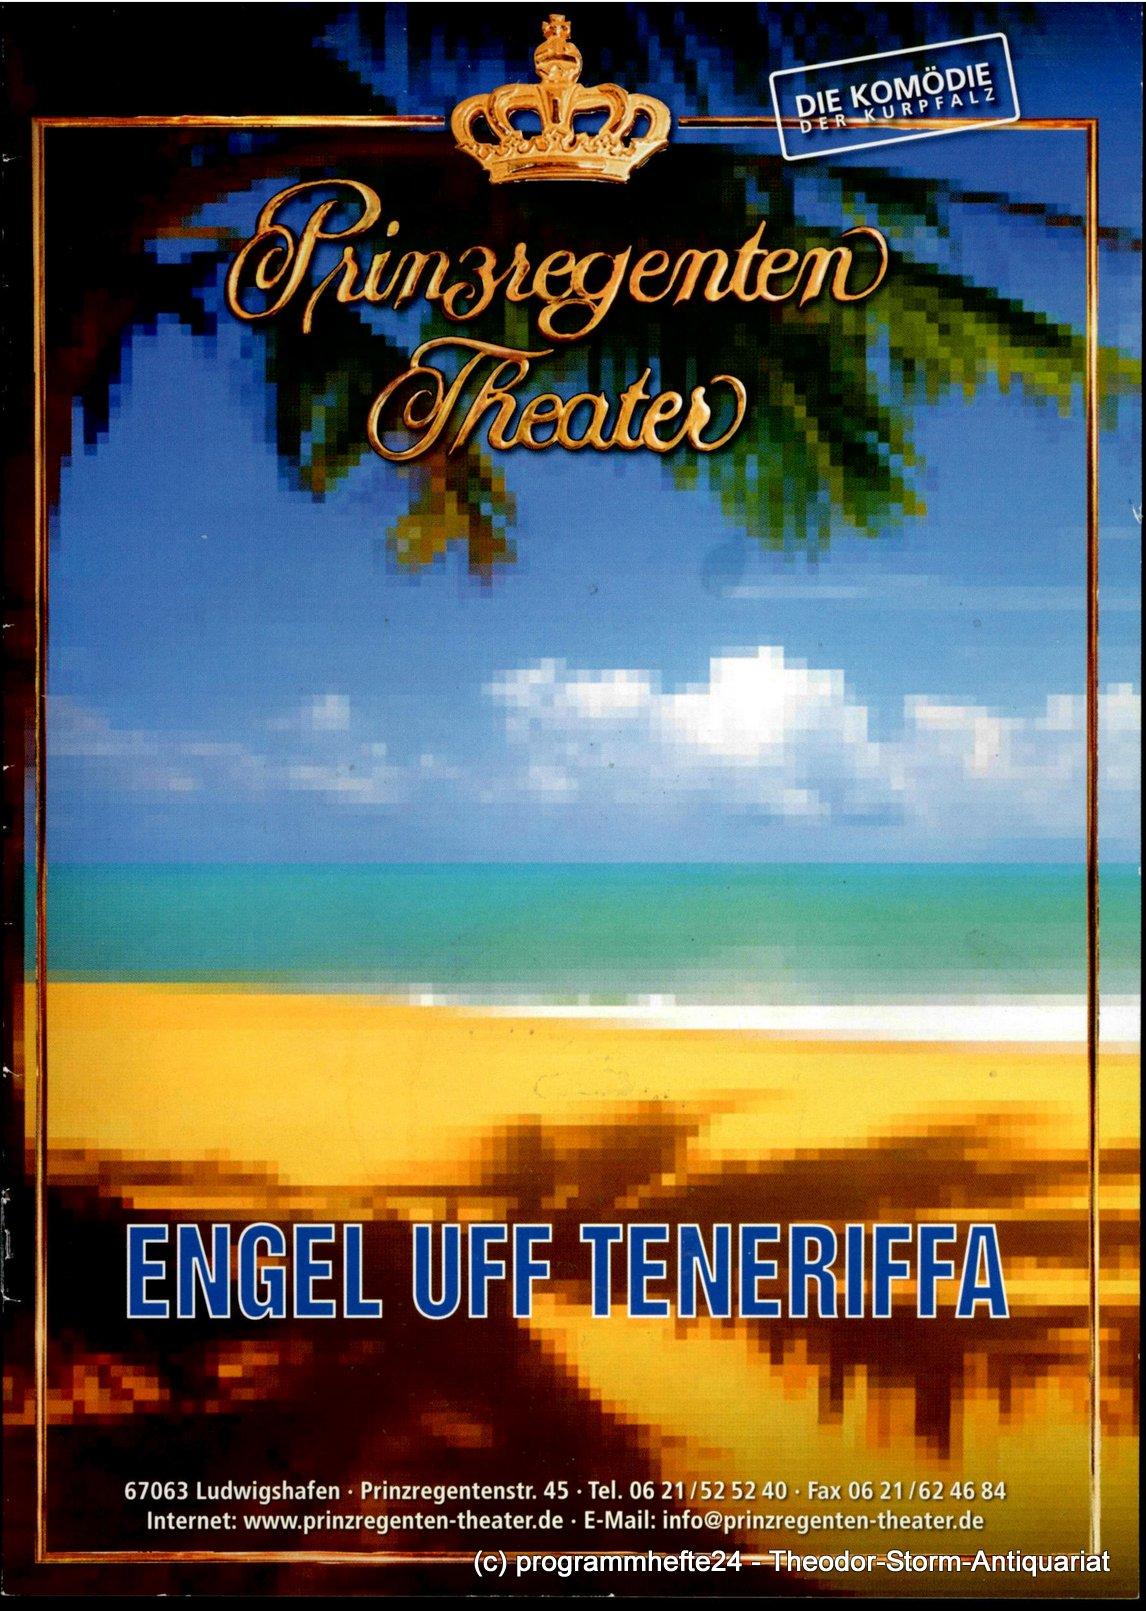 Programmheft Engel uff Teneriffa Prinzregenten-Theater Ludwigshafen